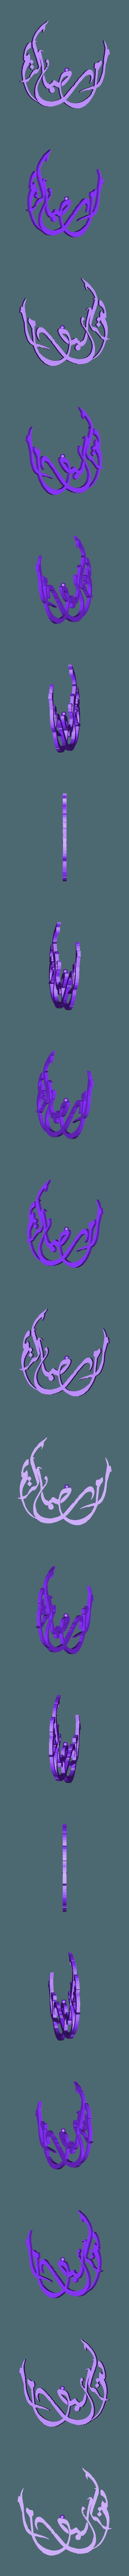 ramadan final .stl Download STL file Ramdan Kareem  • 3D printer object, archiahmednabil